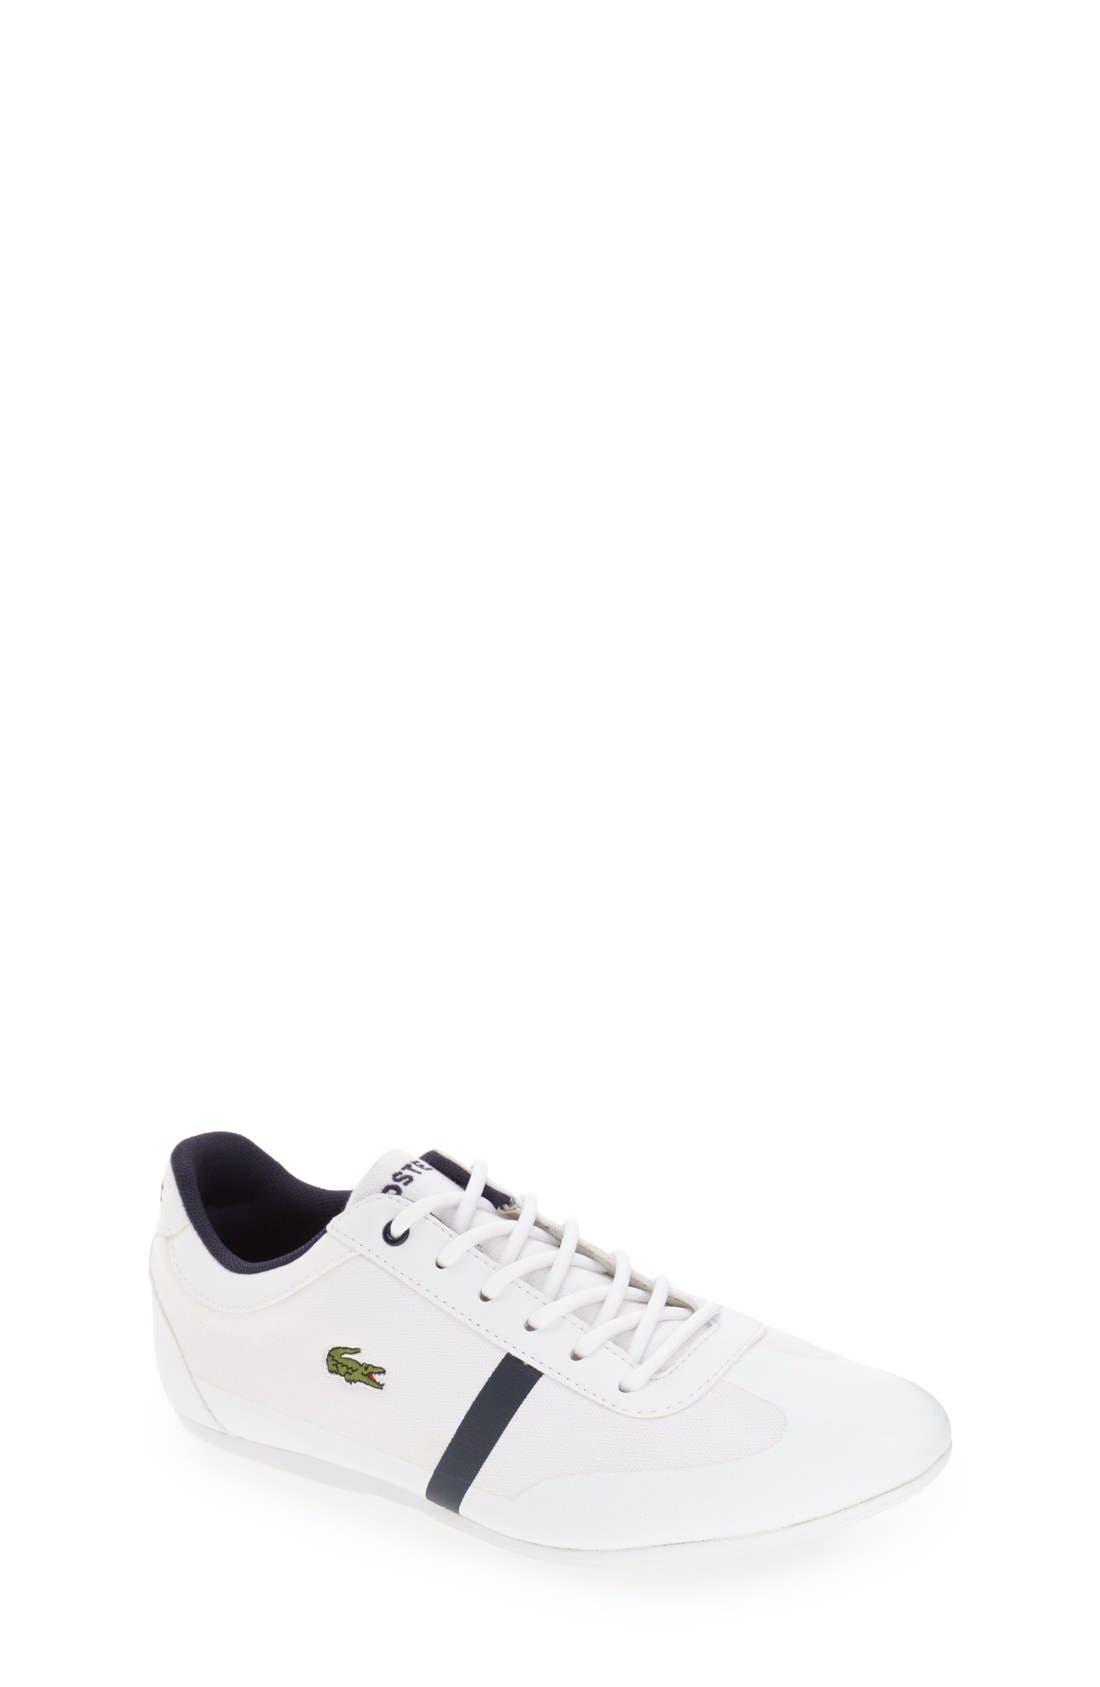 'Misano' Sport Sneaker,                         Main,                         color, White